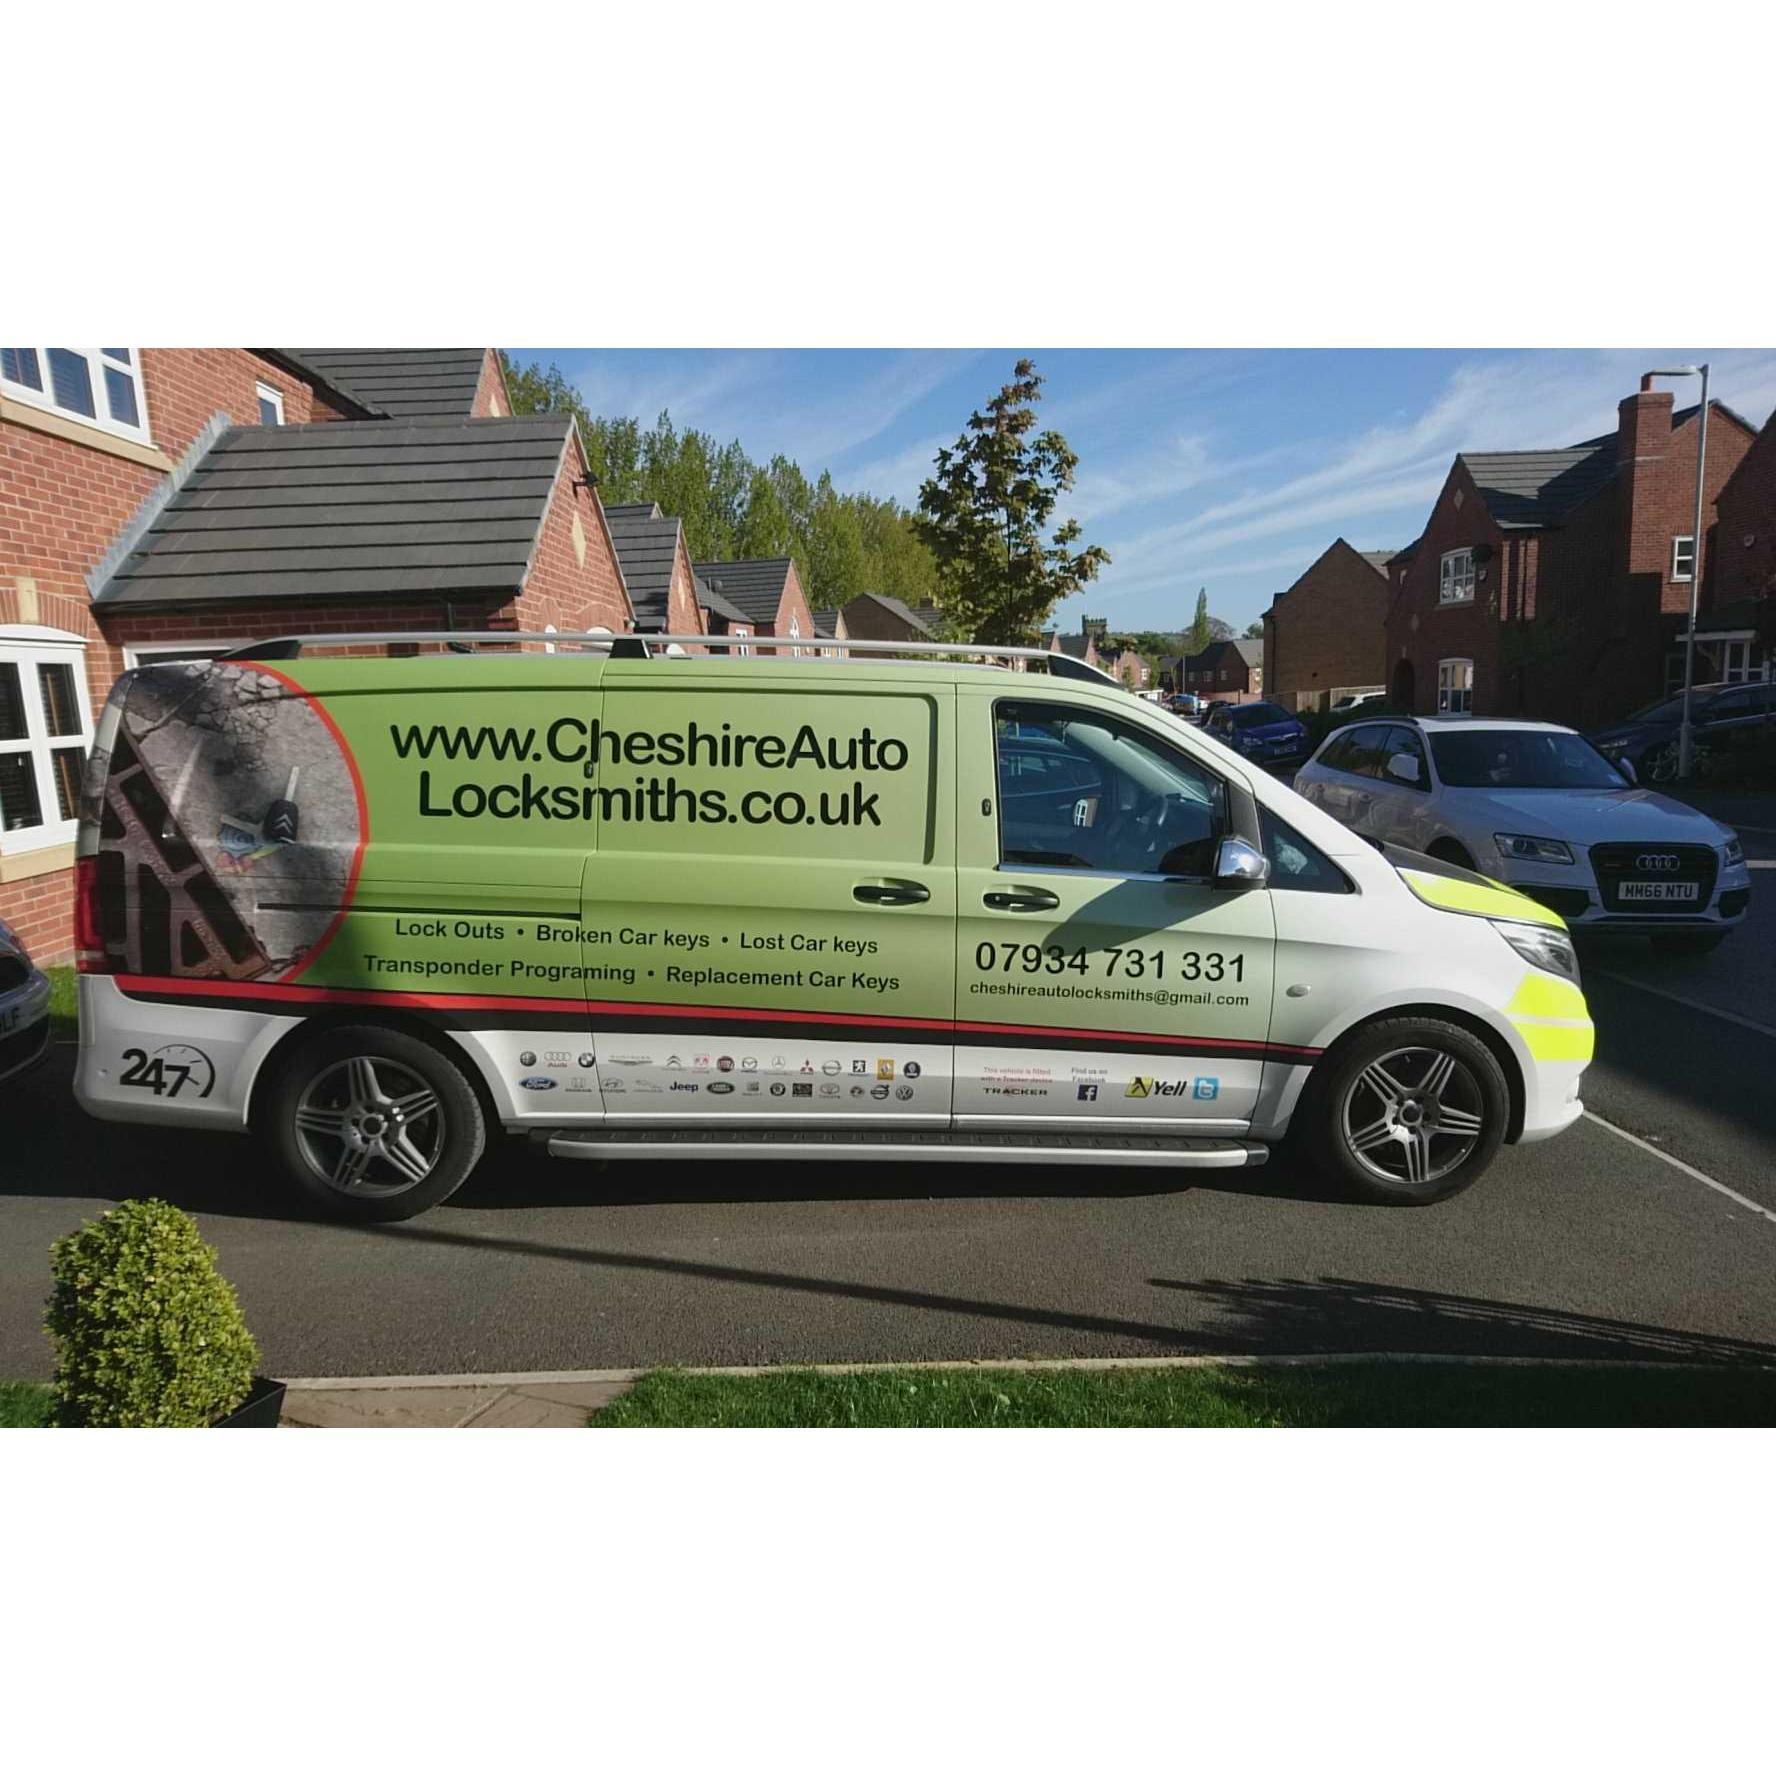 Cheshire Auto Locksmiths - Hyde, Lancashire SK14 4WH - 07934 731331 | ShowMeLocal.com